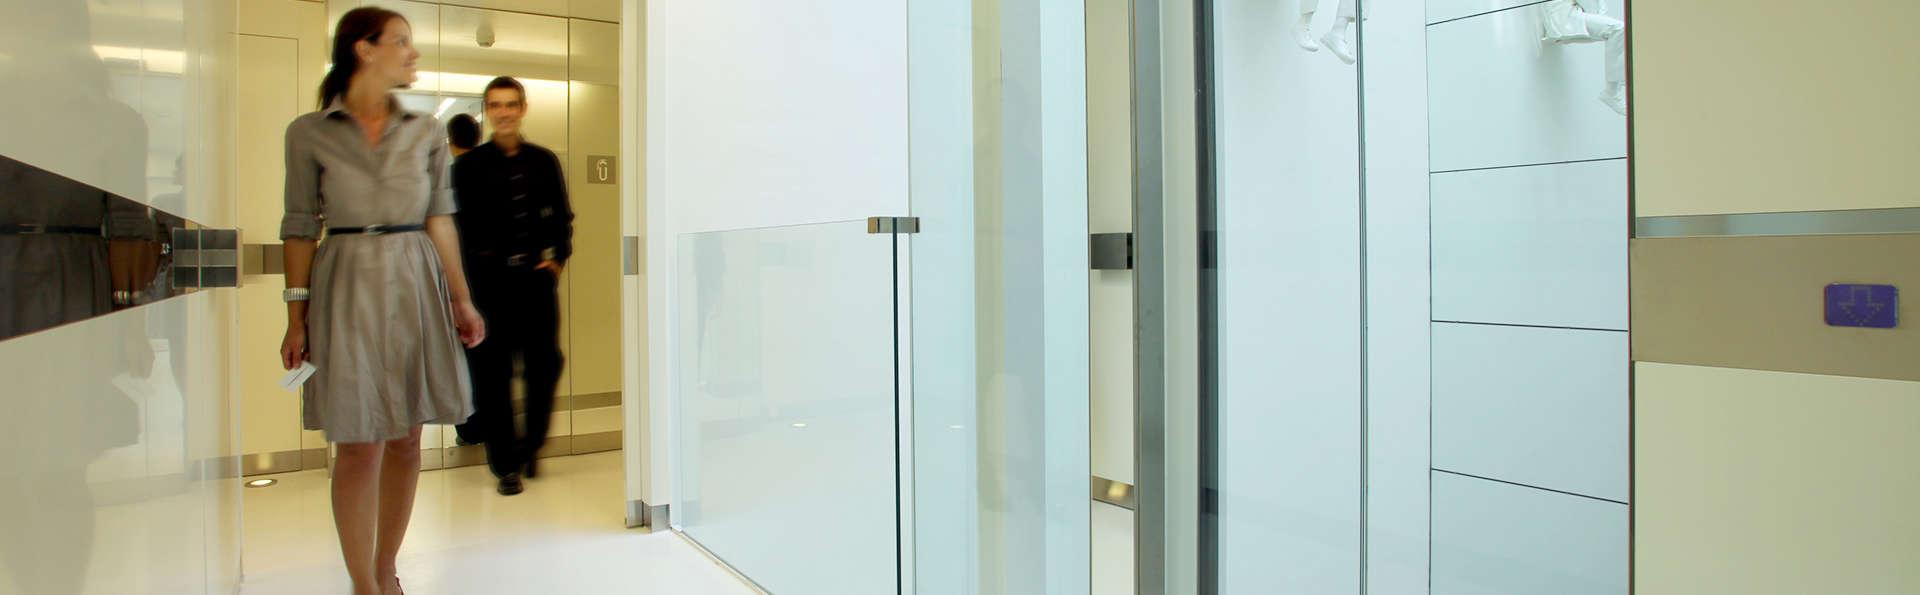 The Mirror Hotel - EDIT_HALL_01.jpg